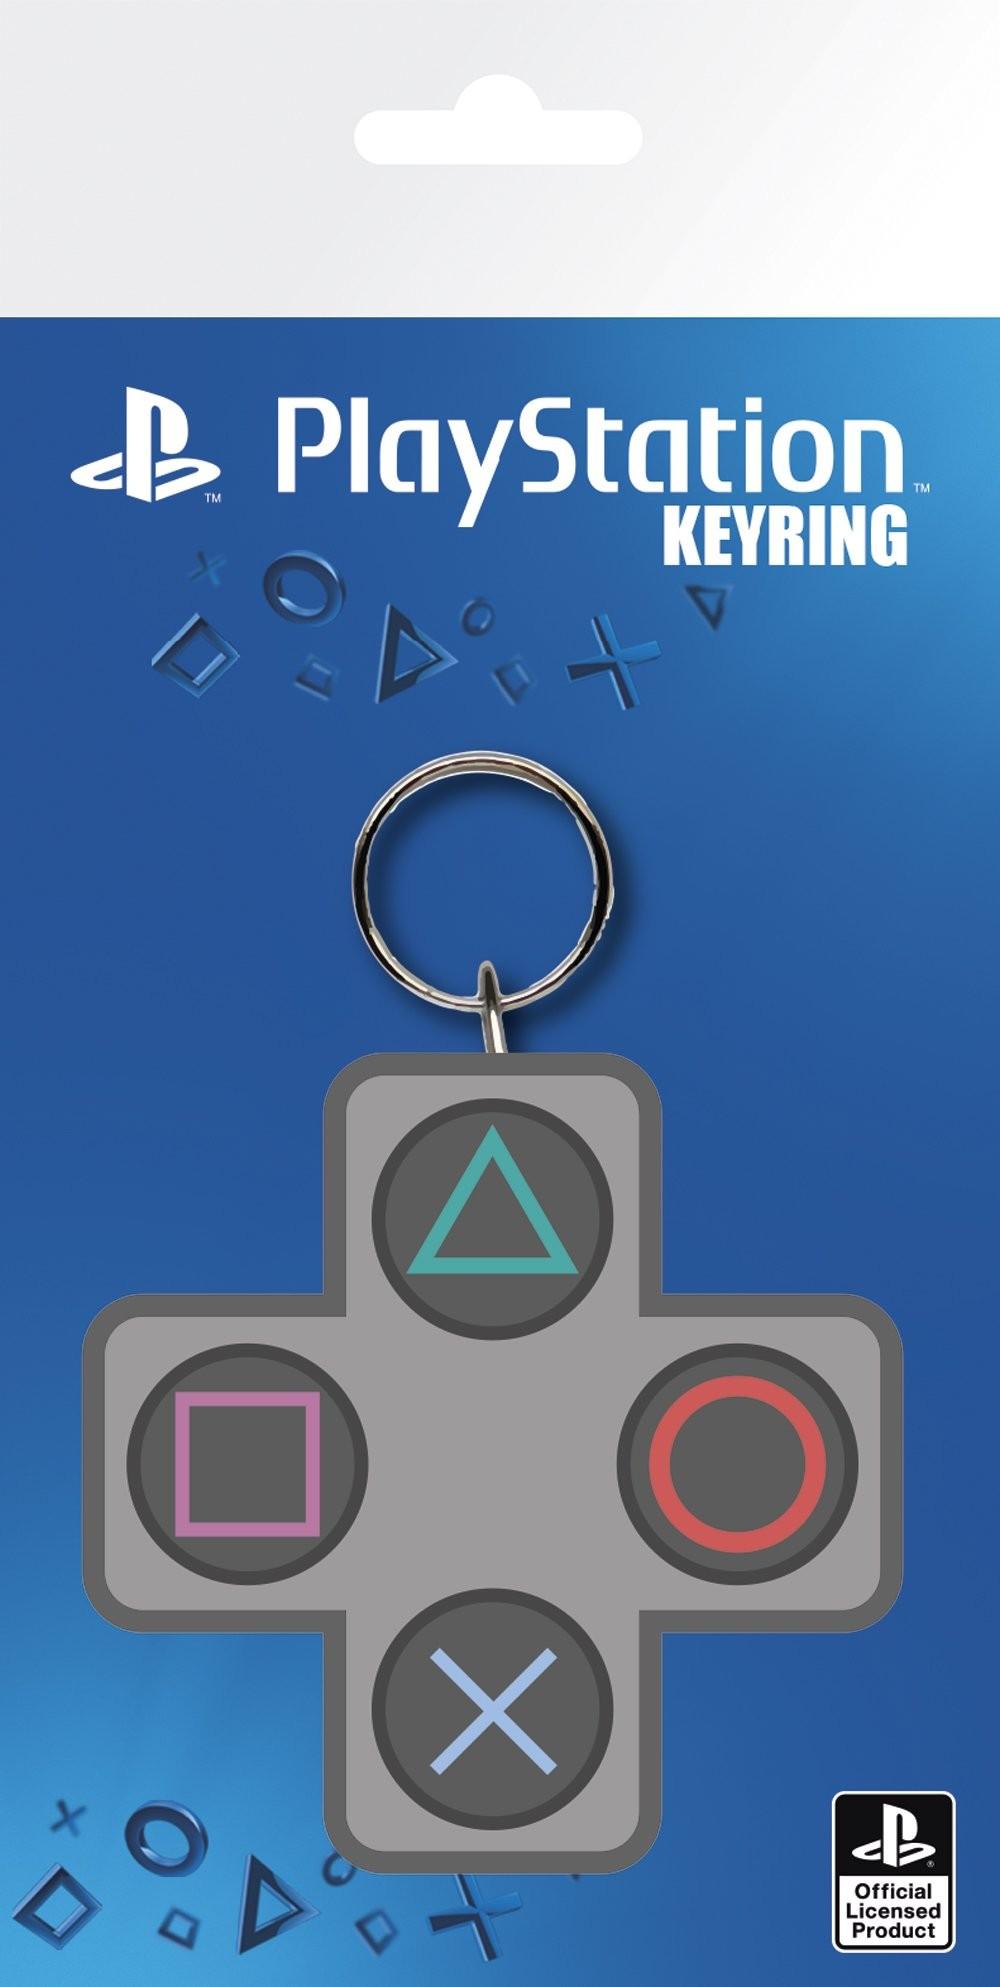 PLAYSTATION Buttons guminis pakabukas